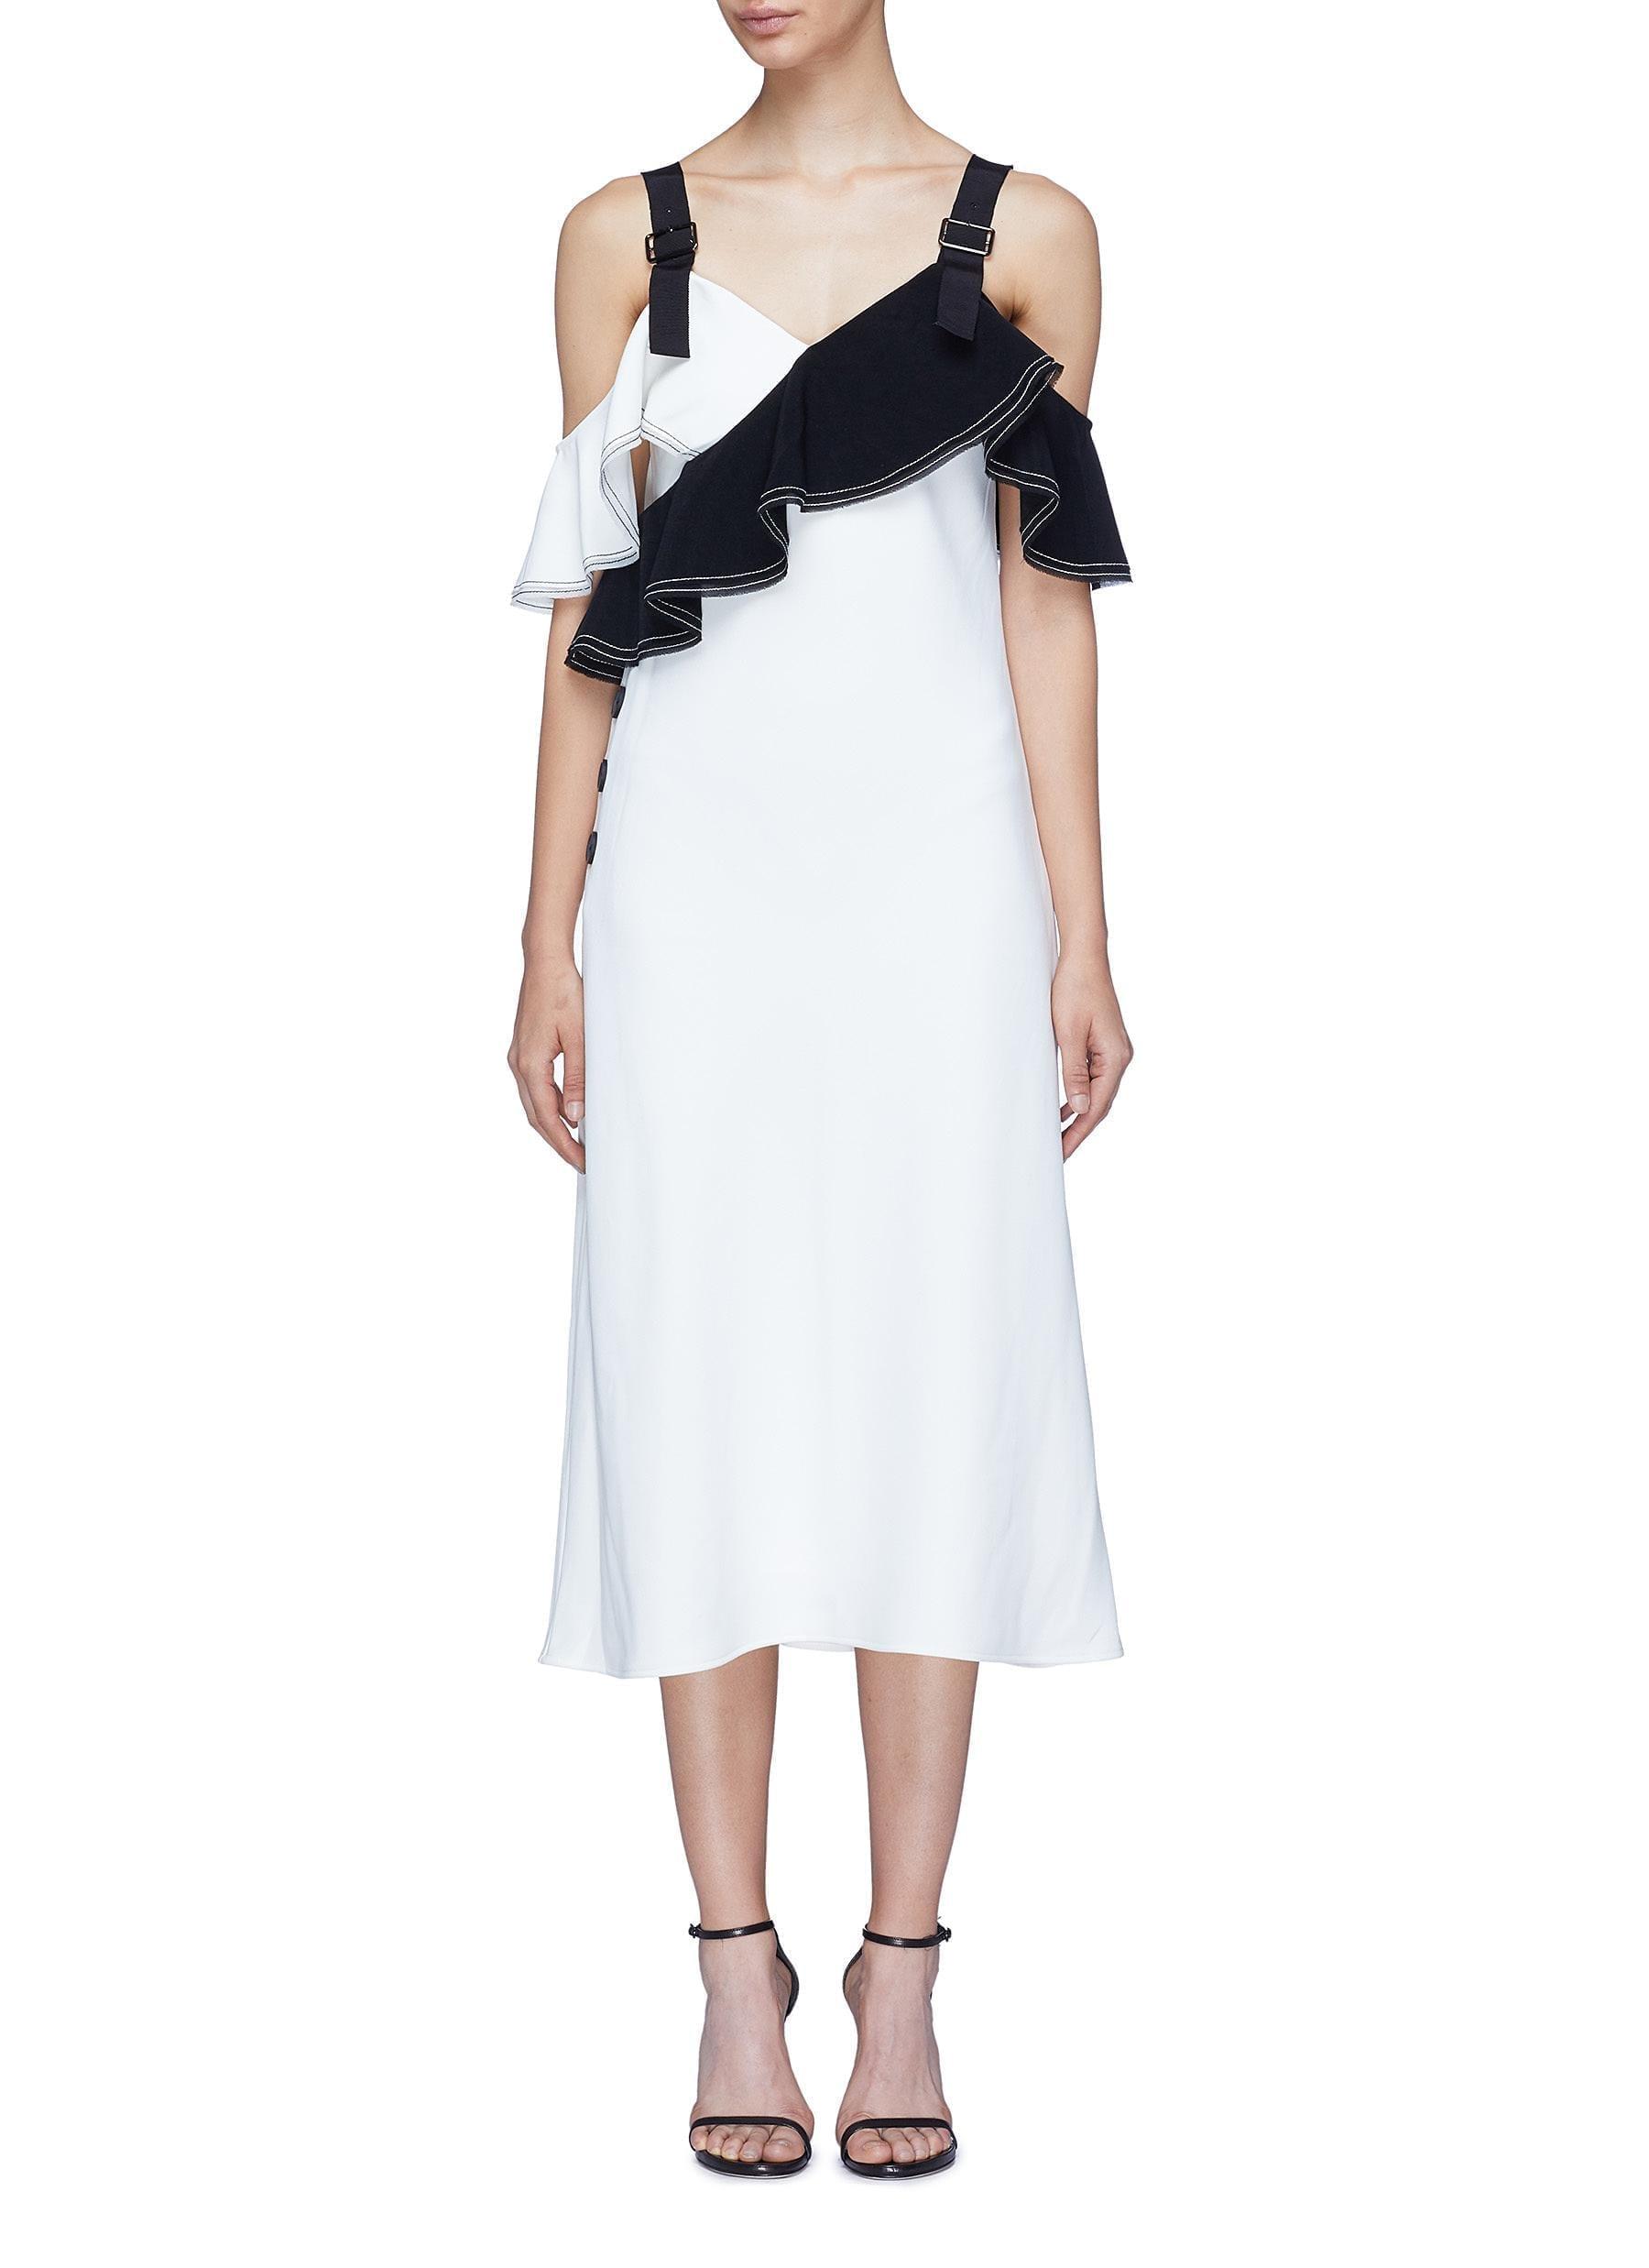 SELF-PORTRAIT Colourblock Ruffle Off-shoulder Crepe White / Black Dress